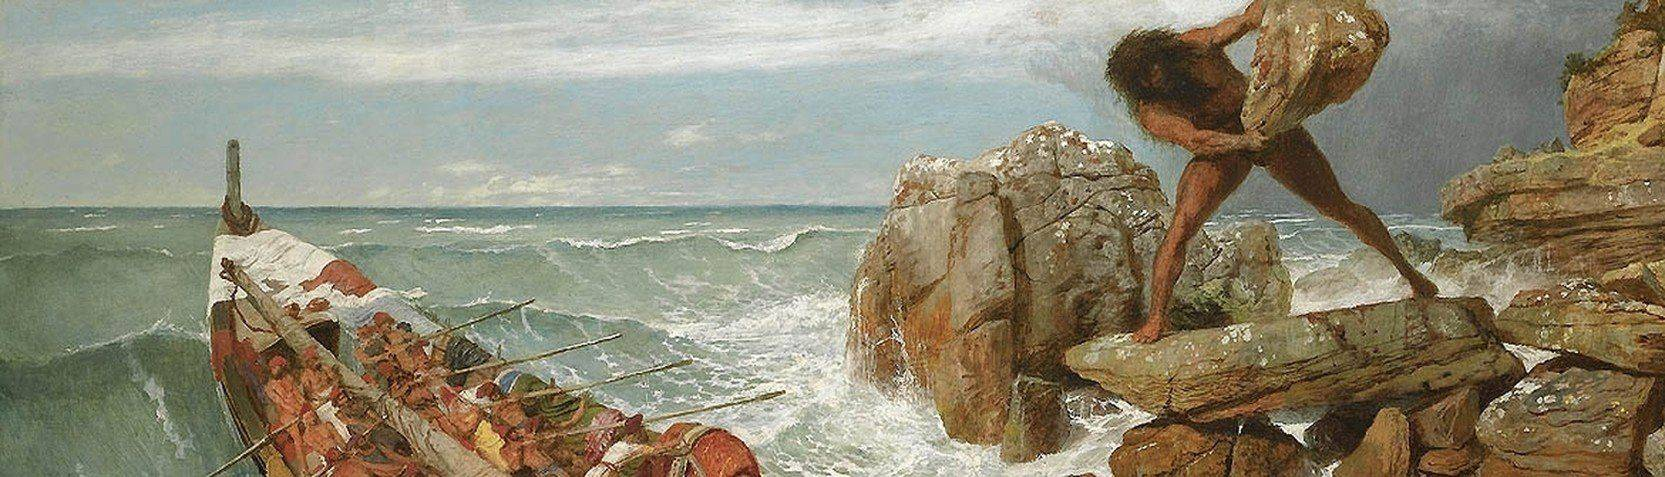 Artistes - Arnold Böcklin